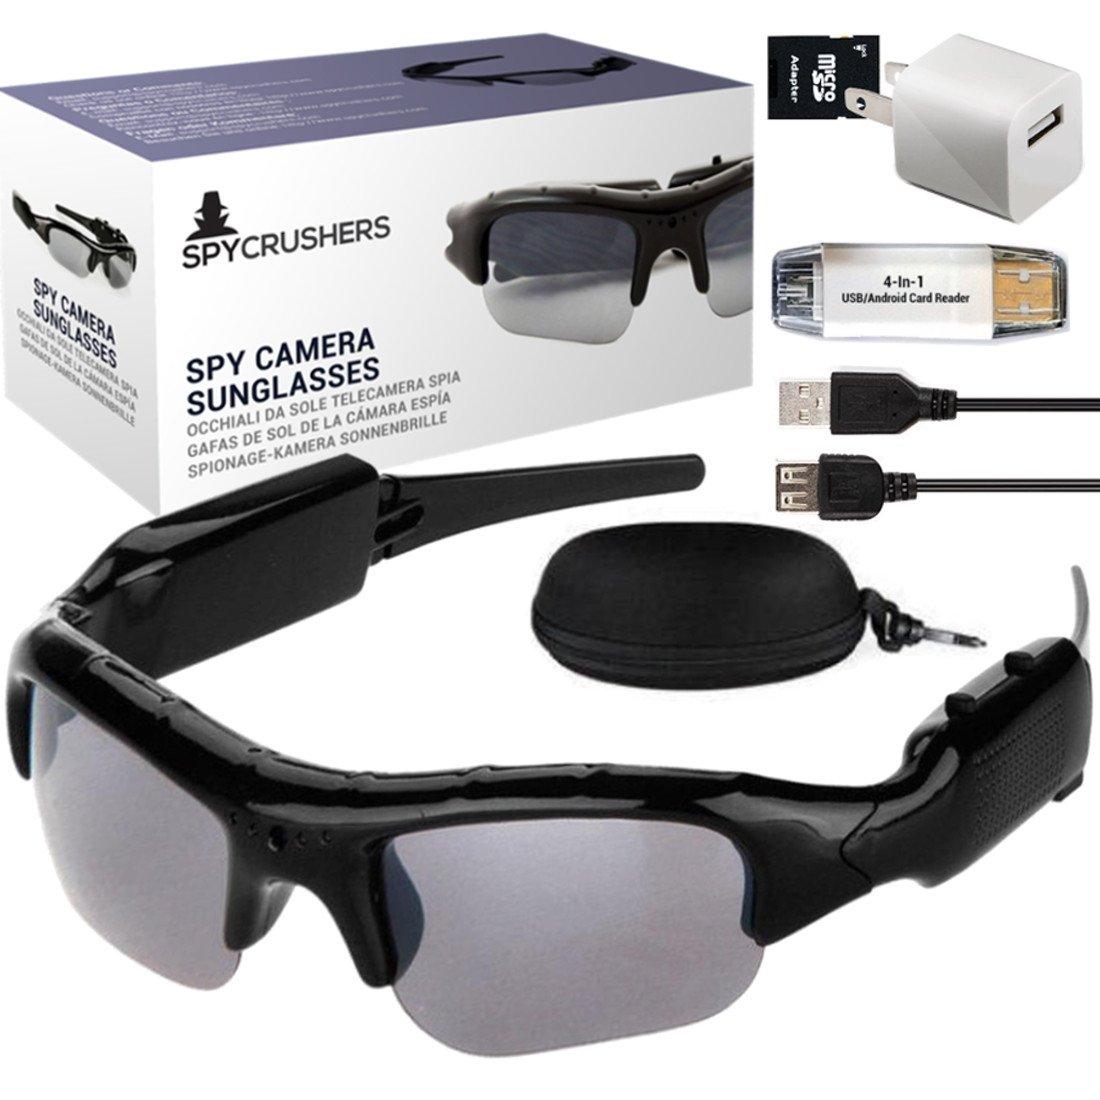 ec5dfeb4f7 Spy camera glasses best gear covert camera features hidden jpg 1100x1100 Spy  cameras for glasses